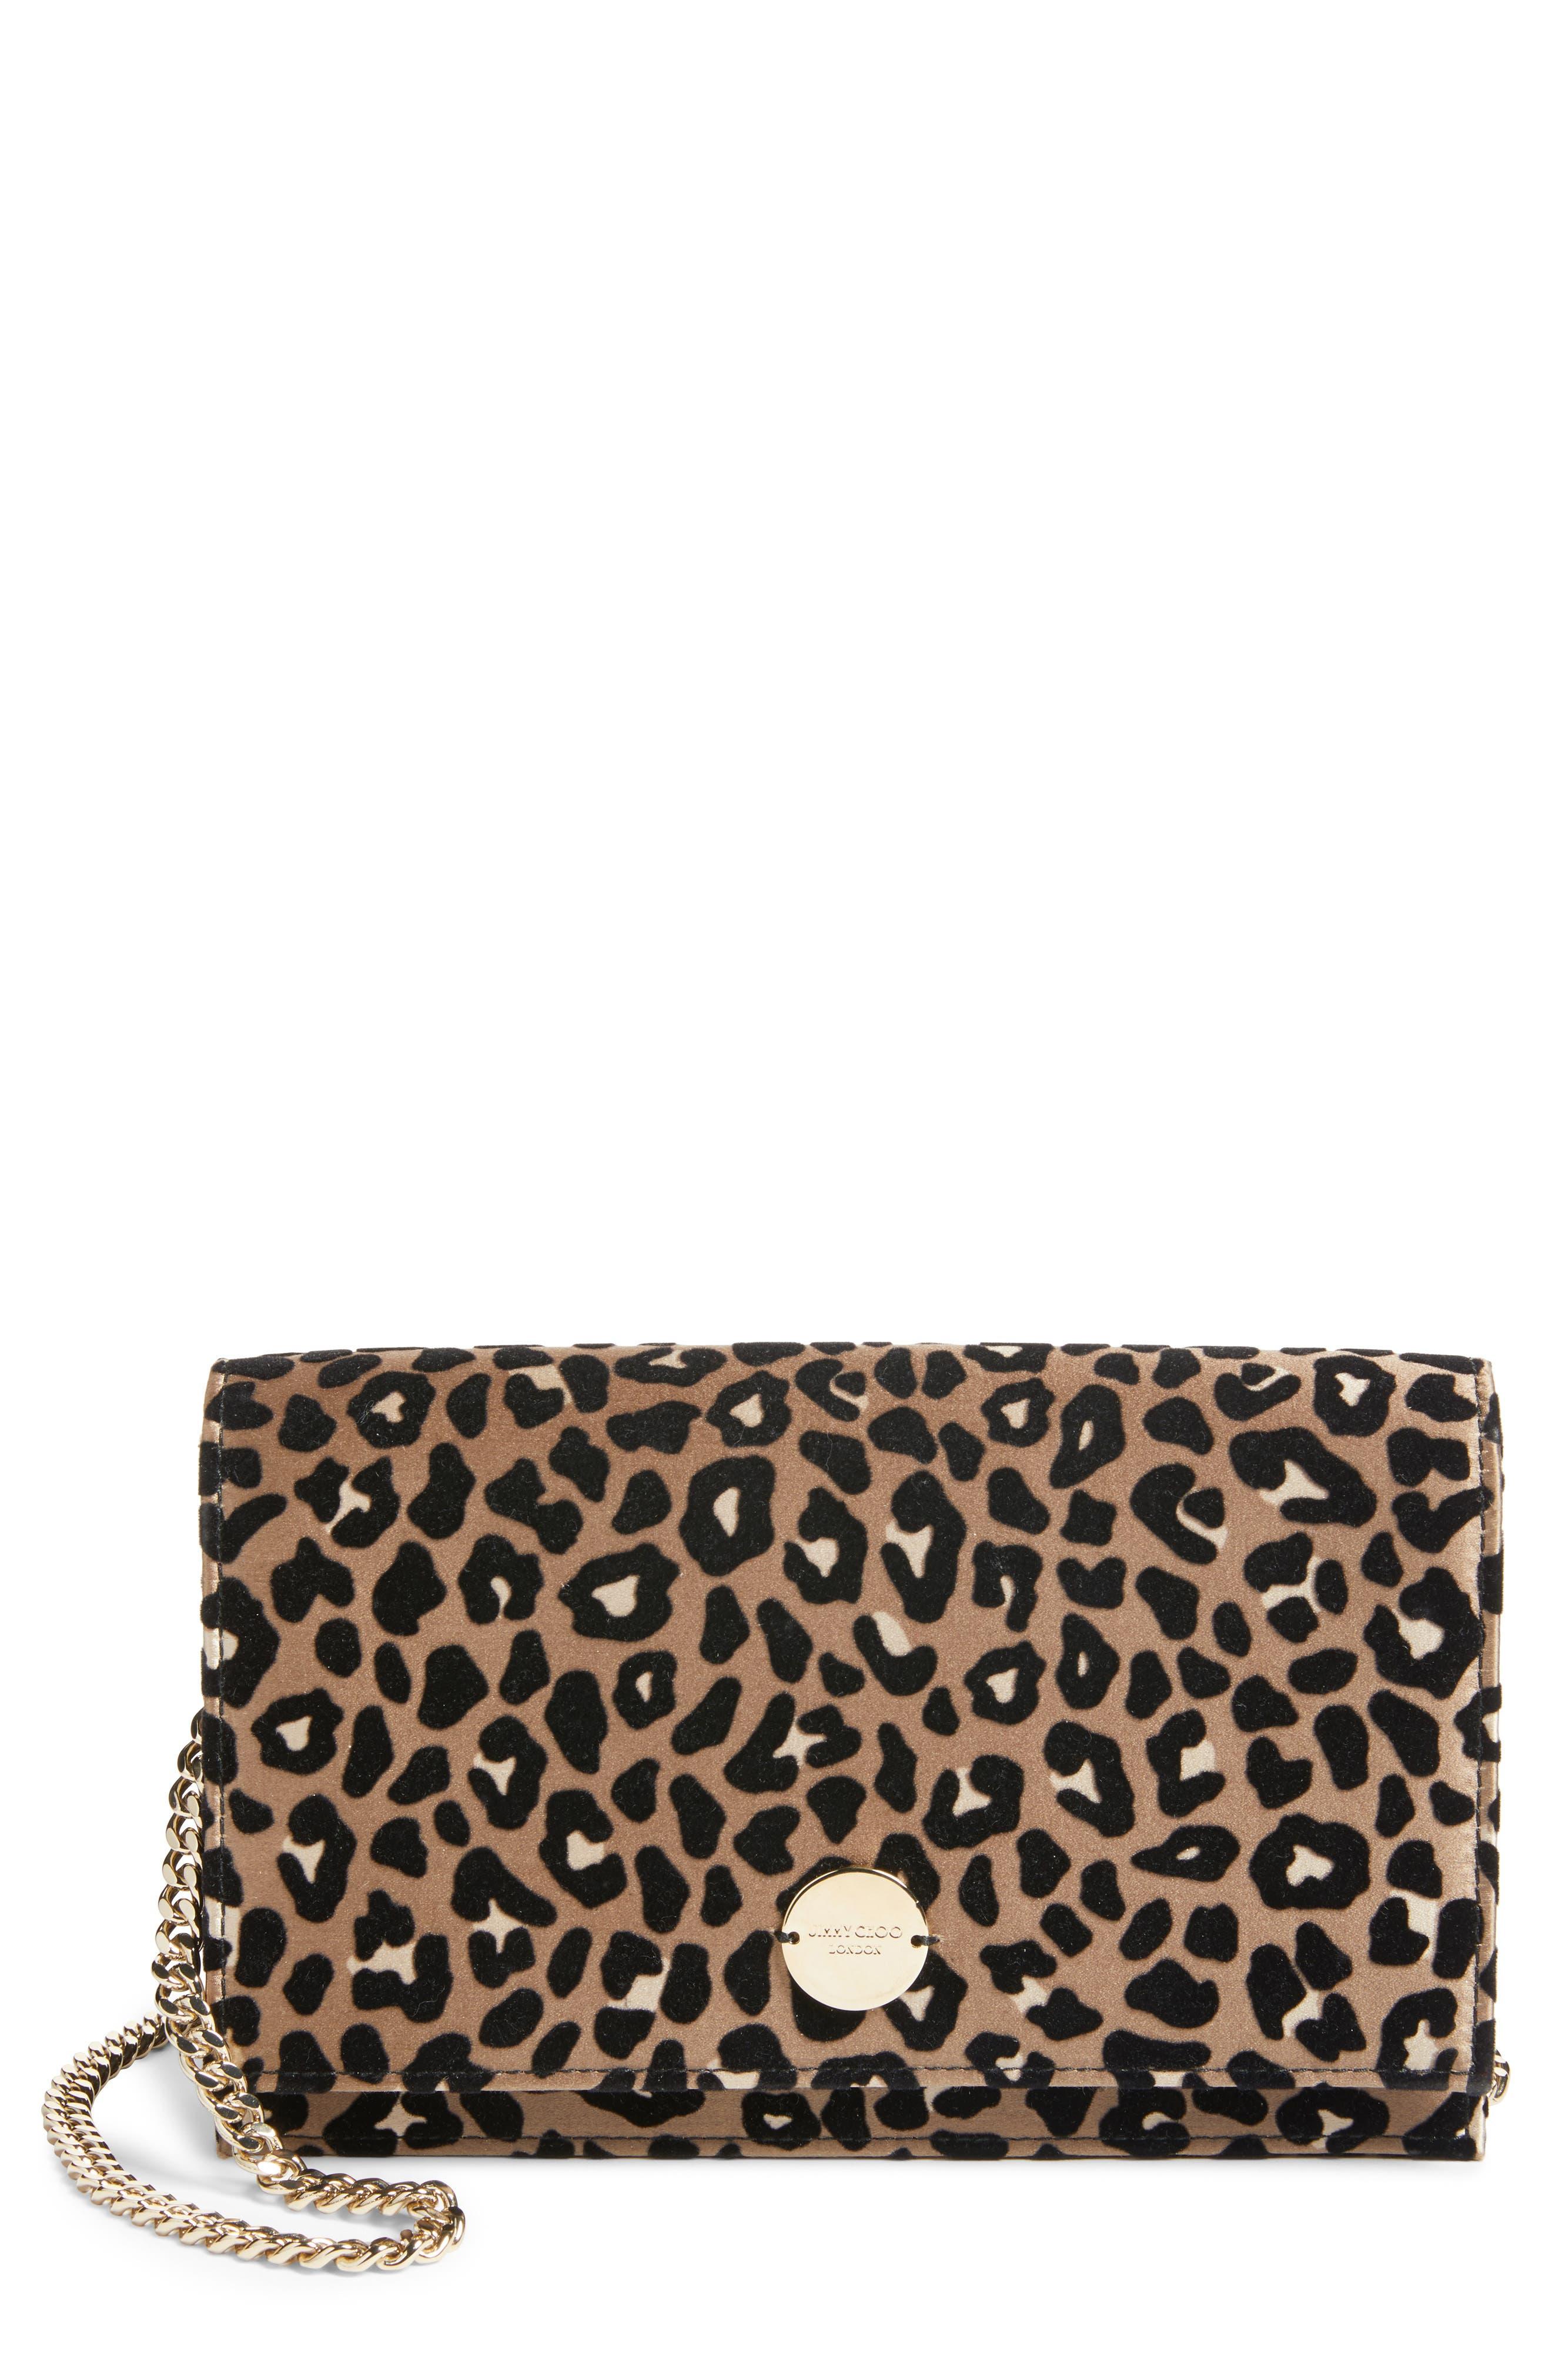 Alternate Image 1 Selected - Jimmy Choo Florence Leopard Print Crossbody Bag